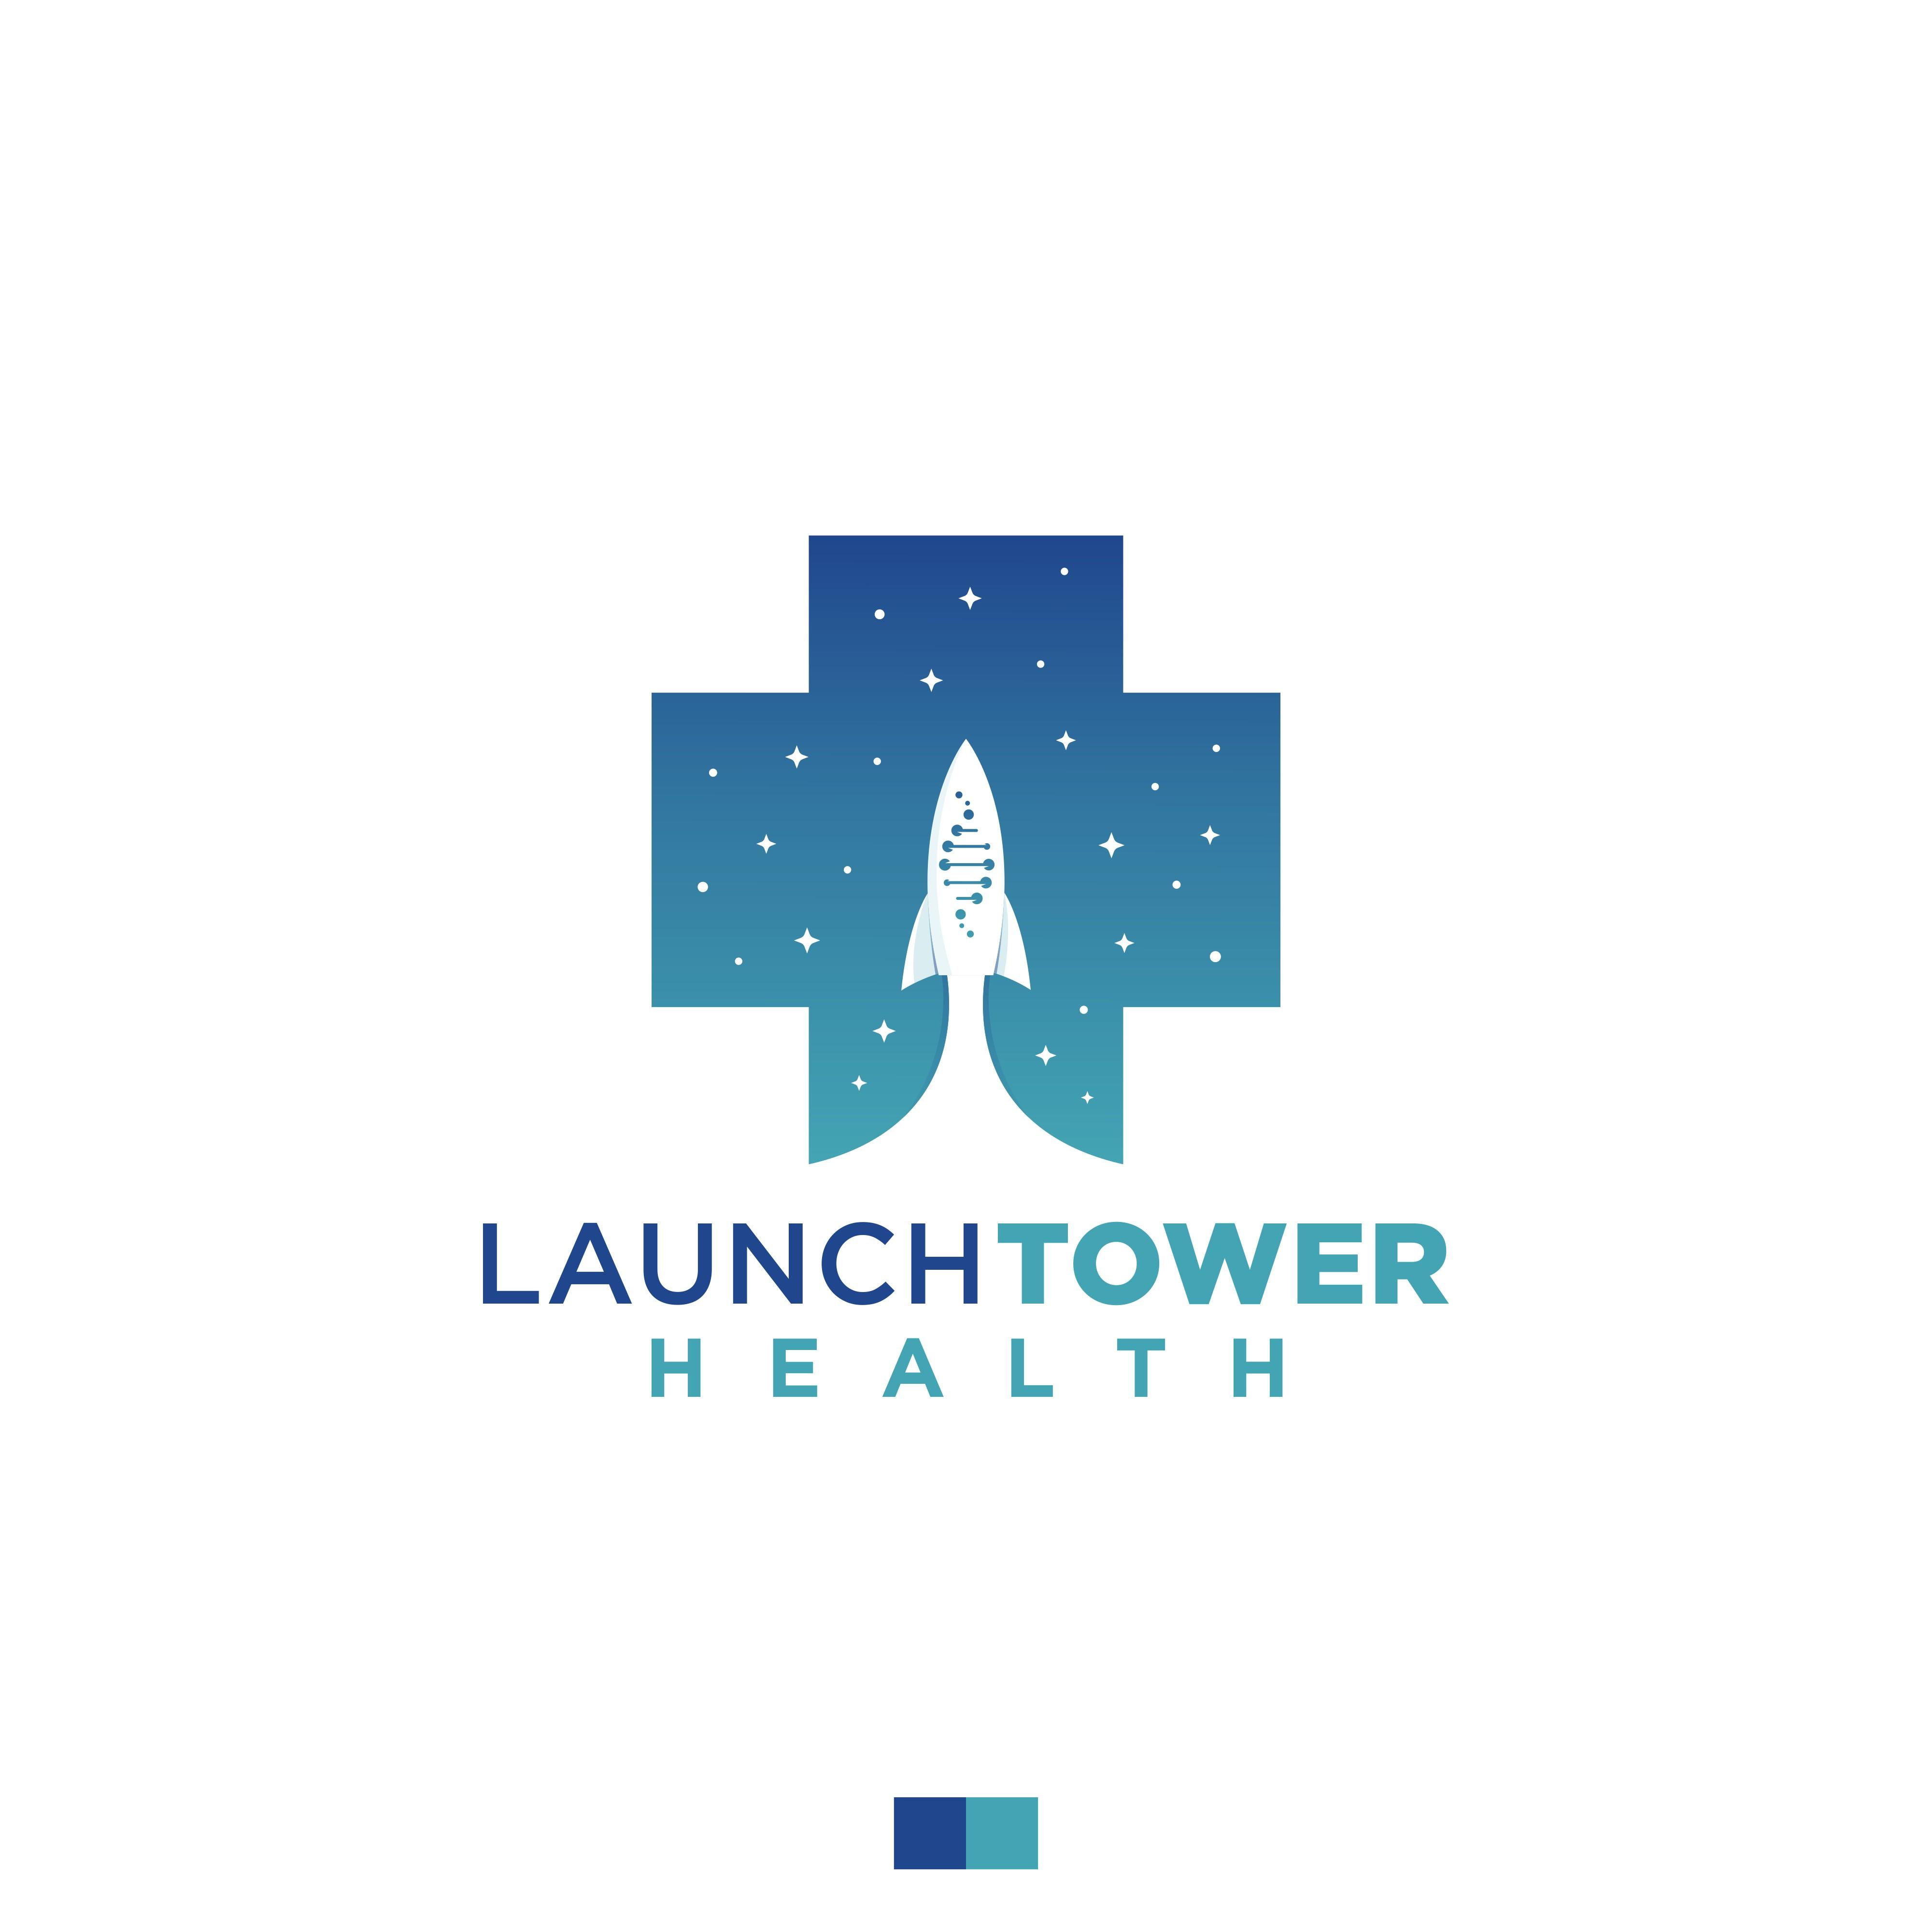 501c3 advancing healthcare entrepreneurship